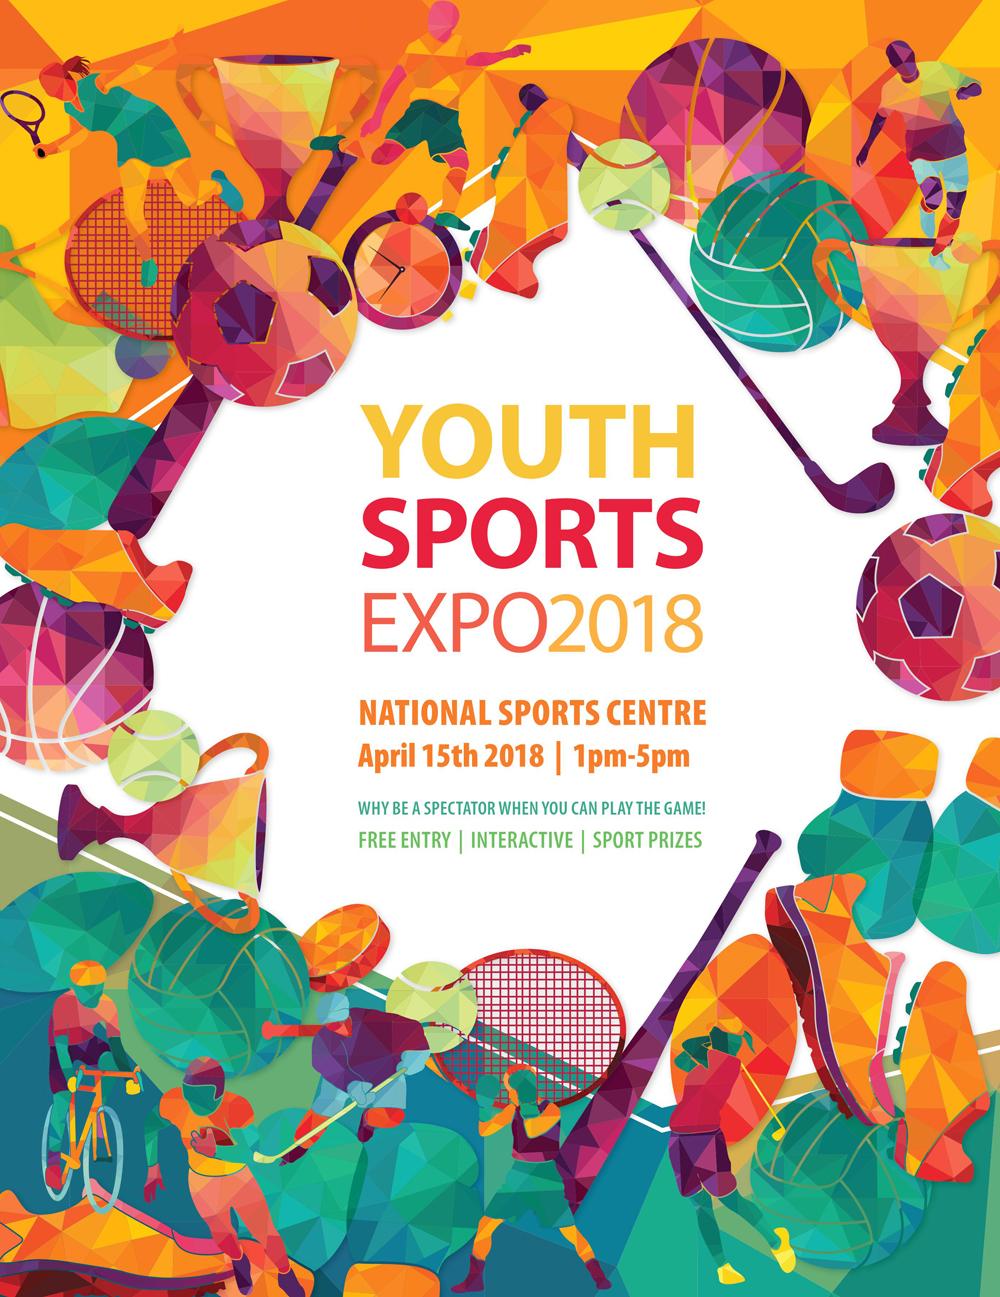 Youth sports expo Bermuda April 11 2018